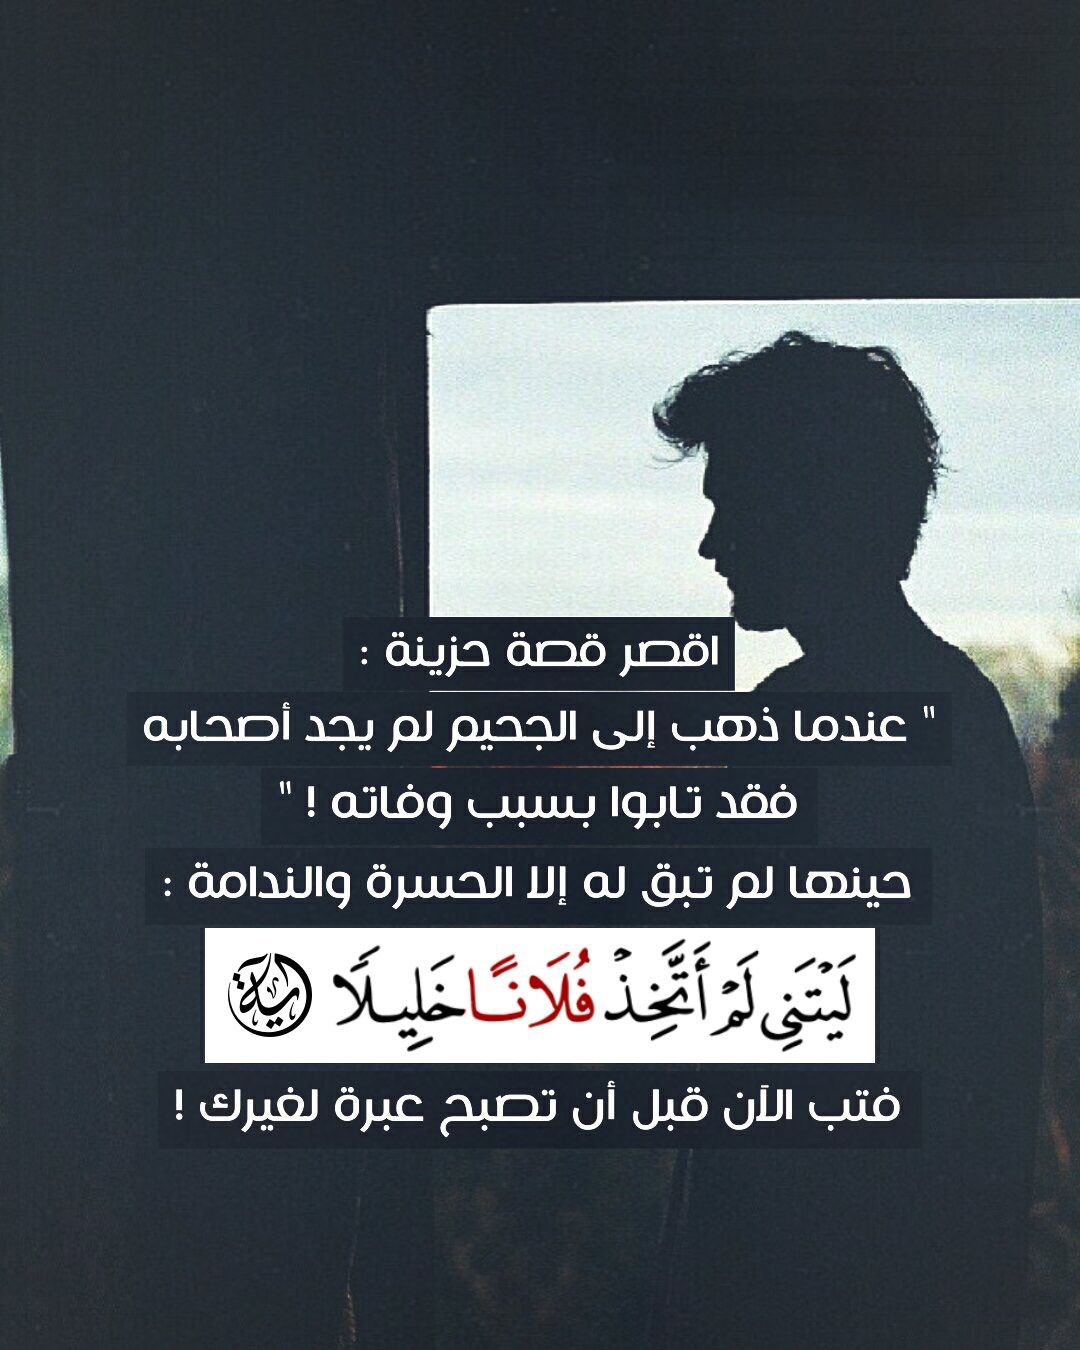 Pin By Amar On تدبر القرآن Islamic Quotes Quran Verses Holy Quran